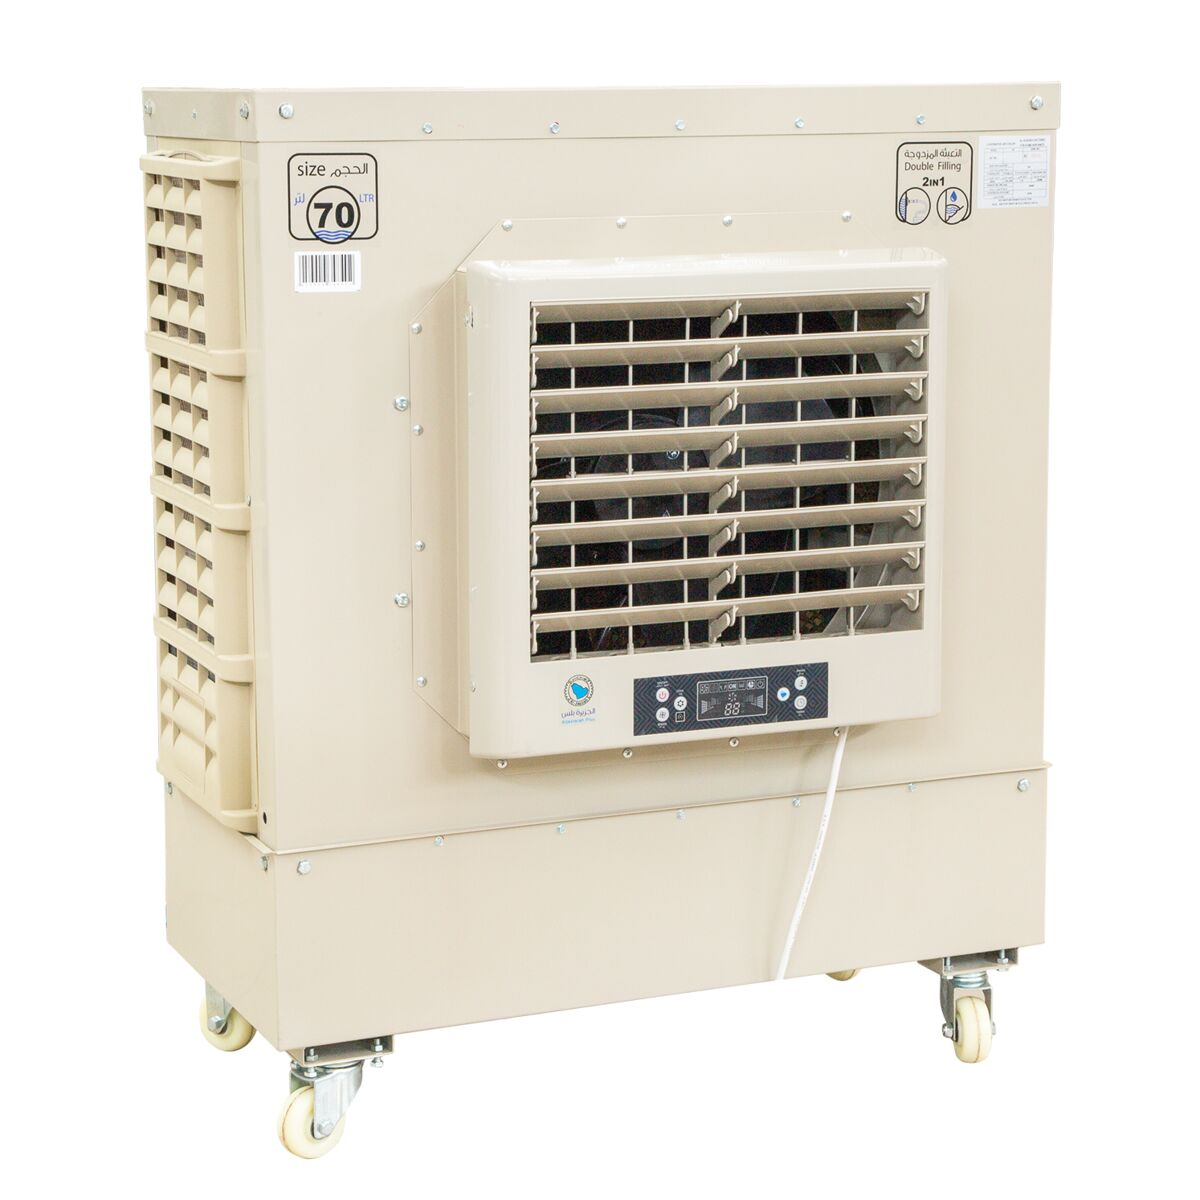 مكيف صحراوي سعة٧٠لتر Outdoor Coolers Outdoor Cooling Heating Outdoor Living Outdoor Saco Store